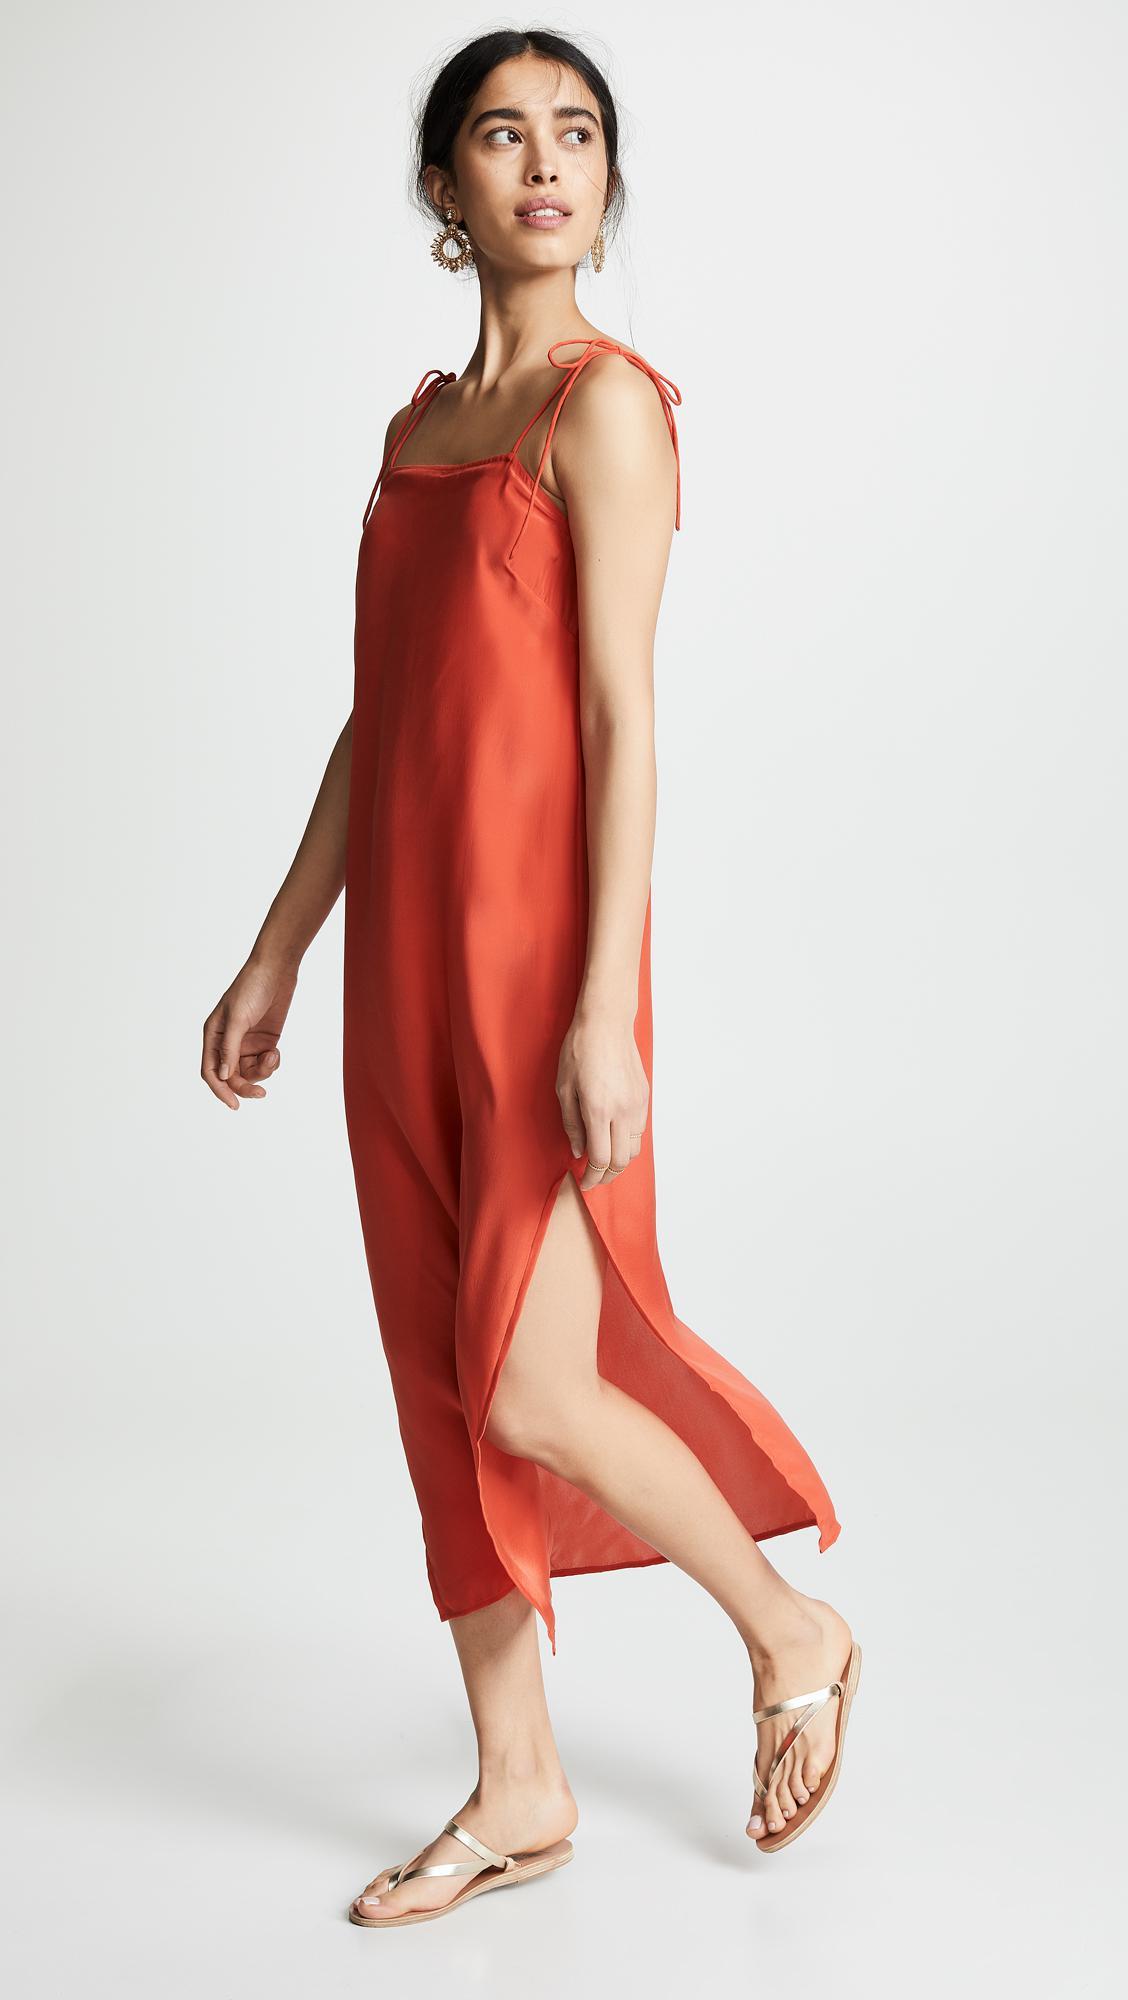 bb8c6cbe91 Mikoh Swimwear Okayama Dress - Save 25% - Lyst